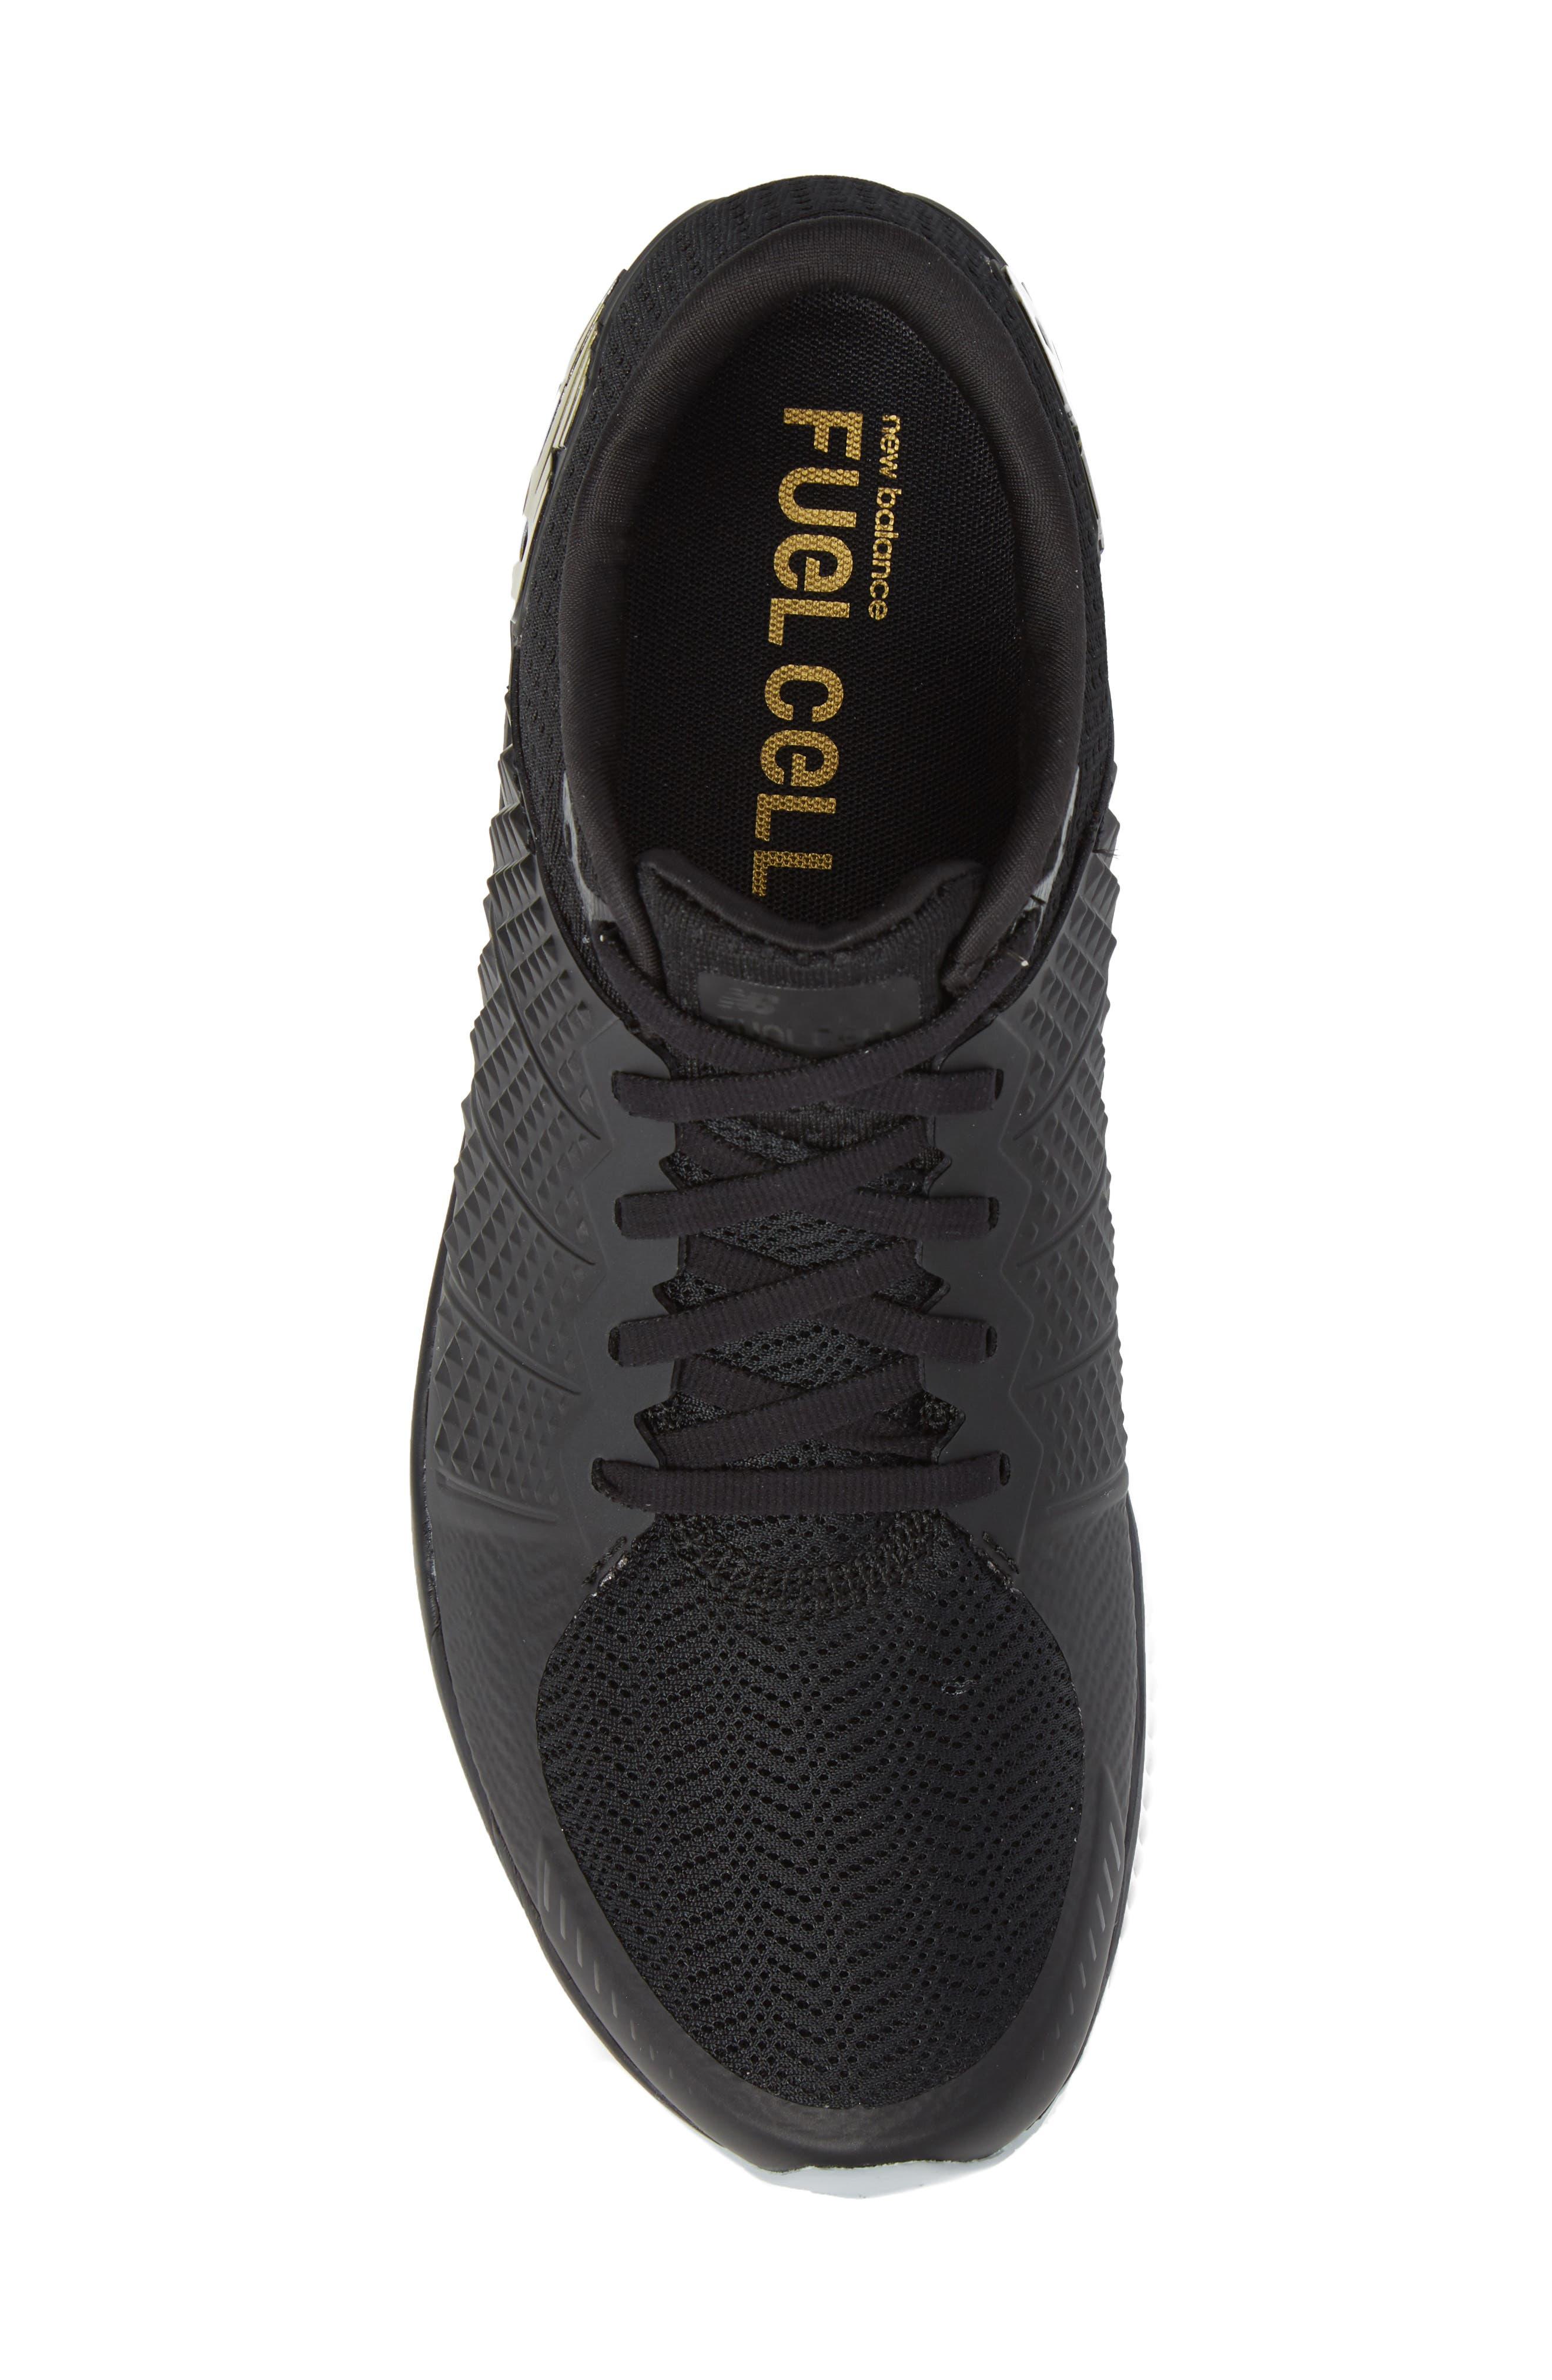 Vazee Fuel Cell Running Shoe,                             Alternate thumbnail 5, color,                             Black